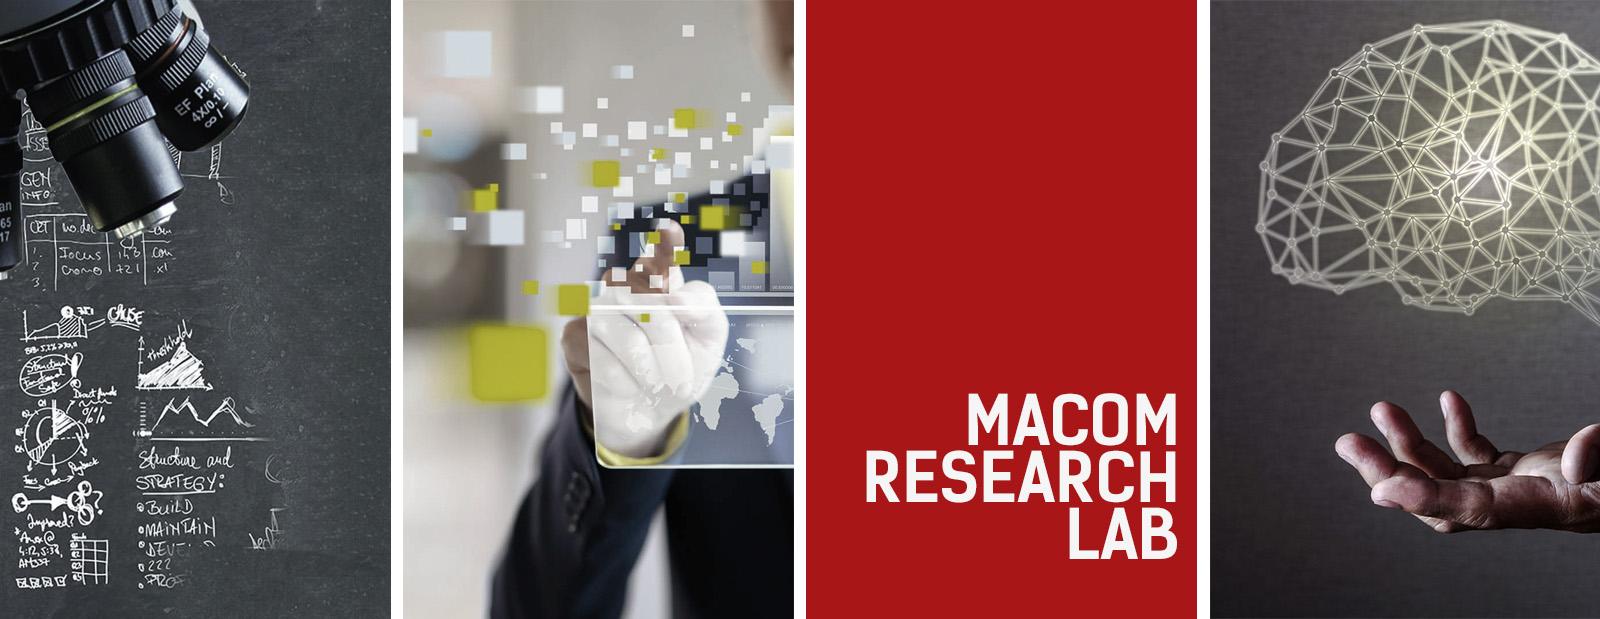 Macom Research Lab